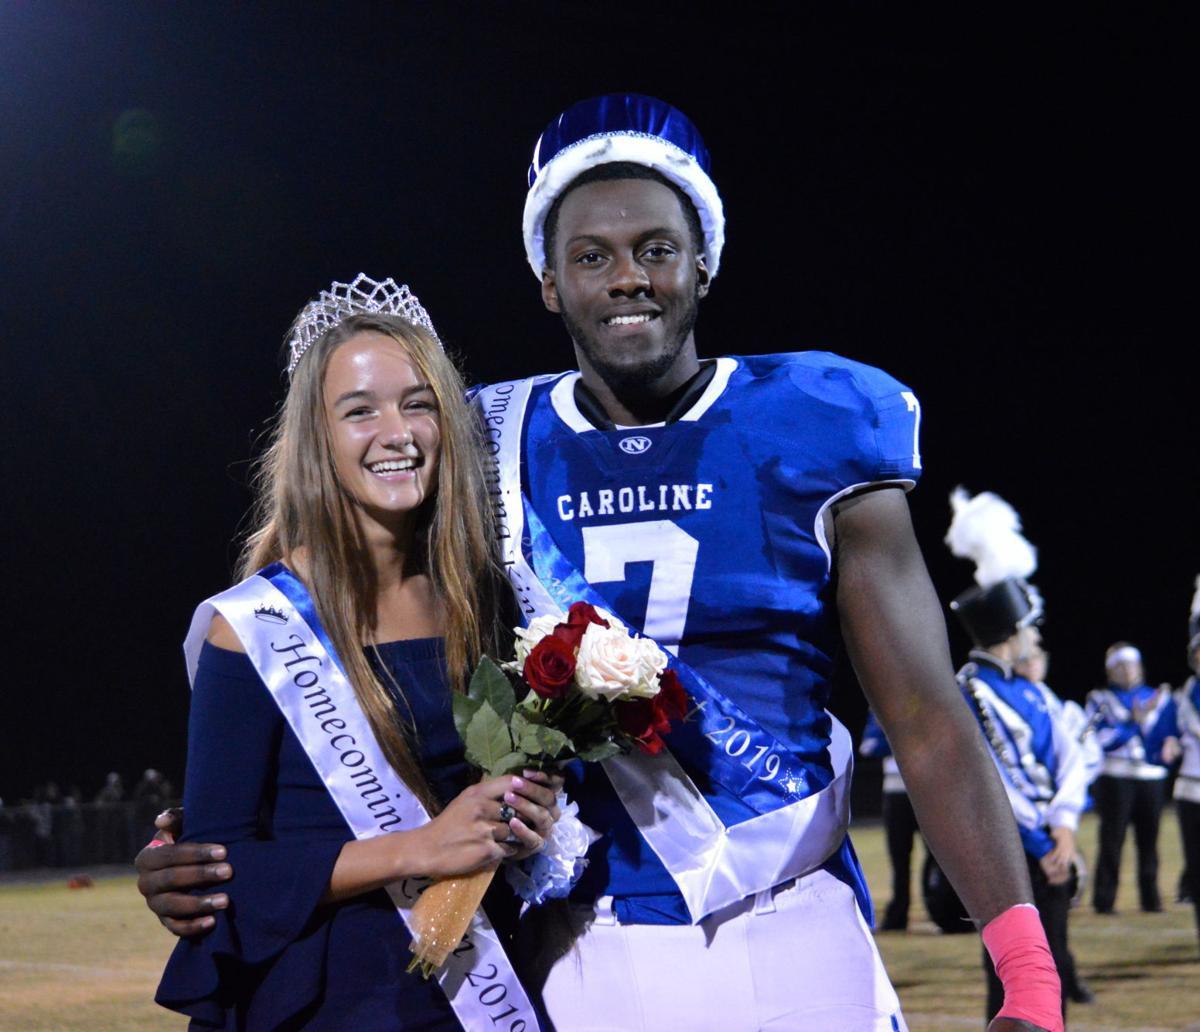 2019 North Caroline High School Homecoming